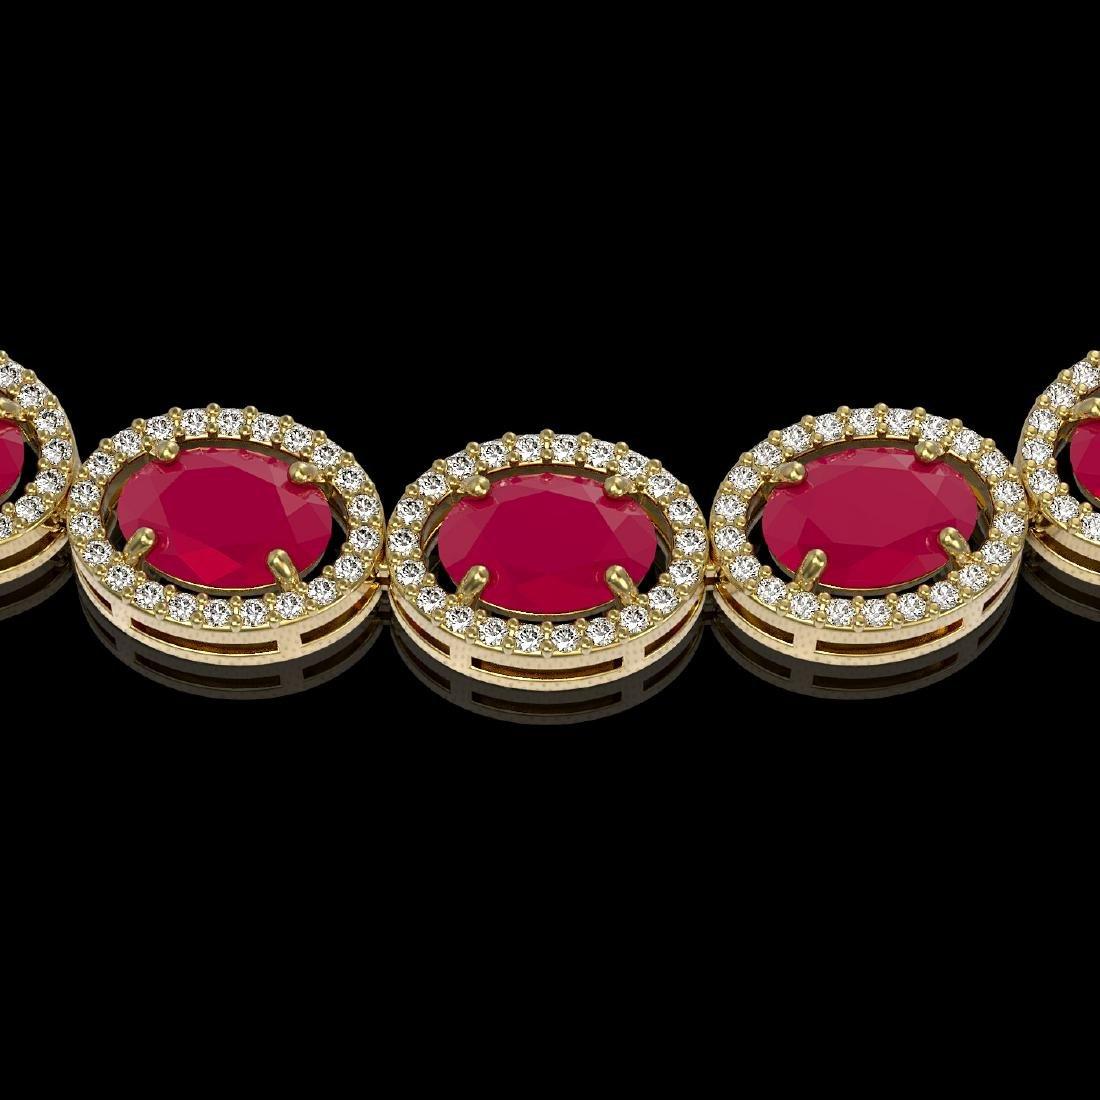 52.15 CTW Ruby & Diamond Halo Necklace 10K Yellow Gold - 3